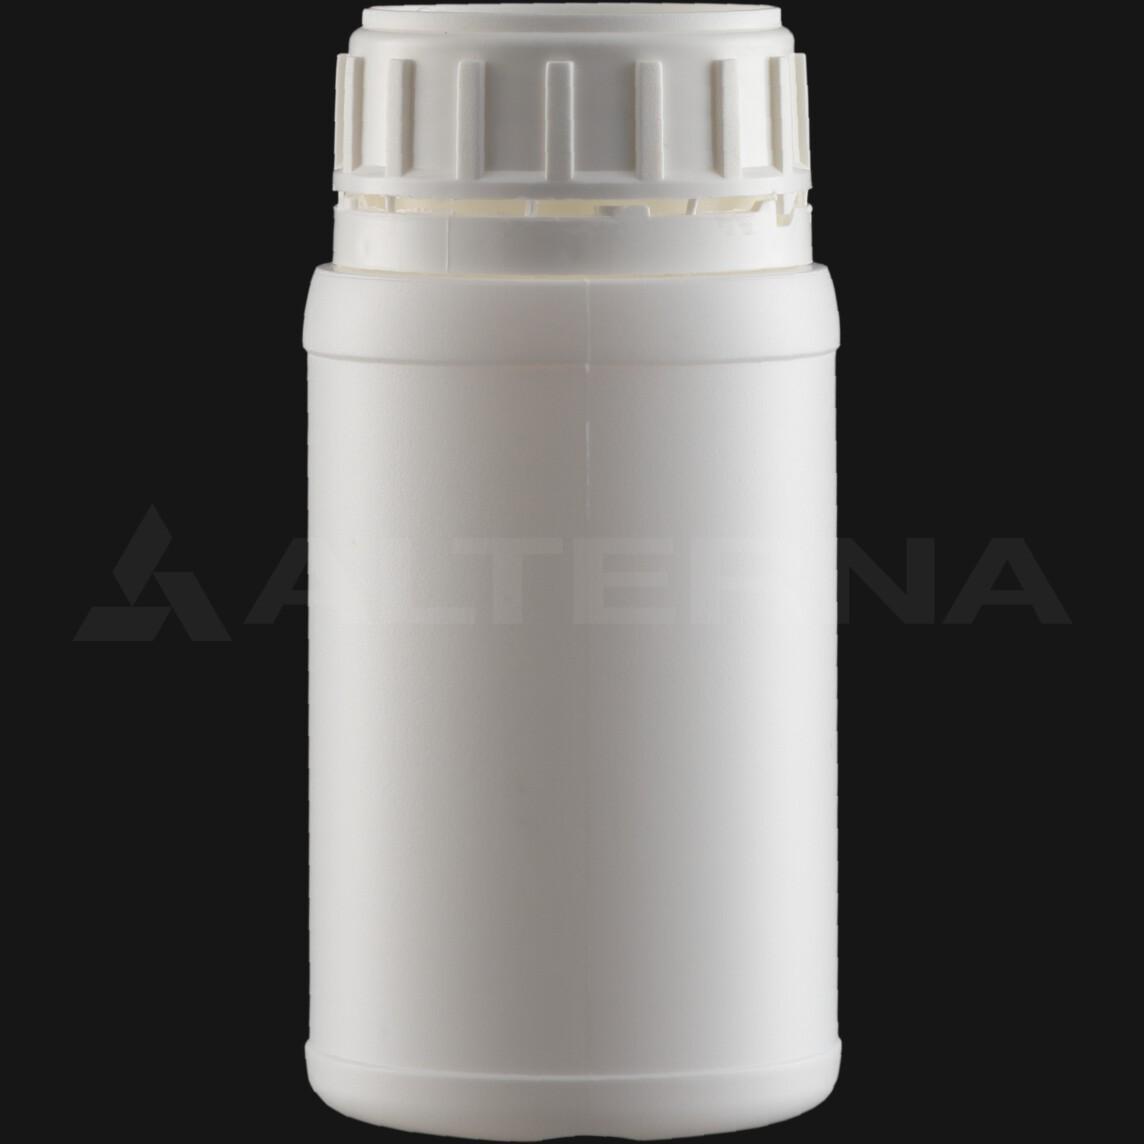 250 ml HDPE Bottle with 50 mm Foam Seal Secure Cap